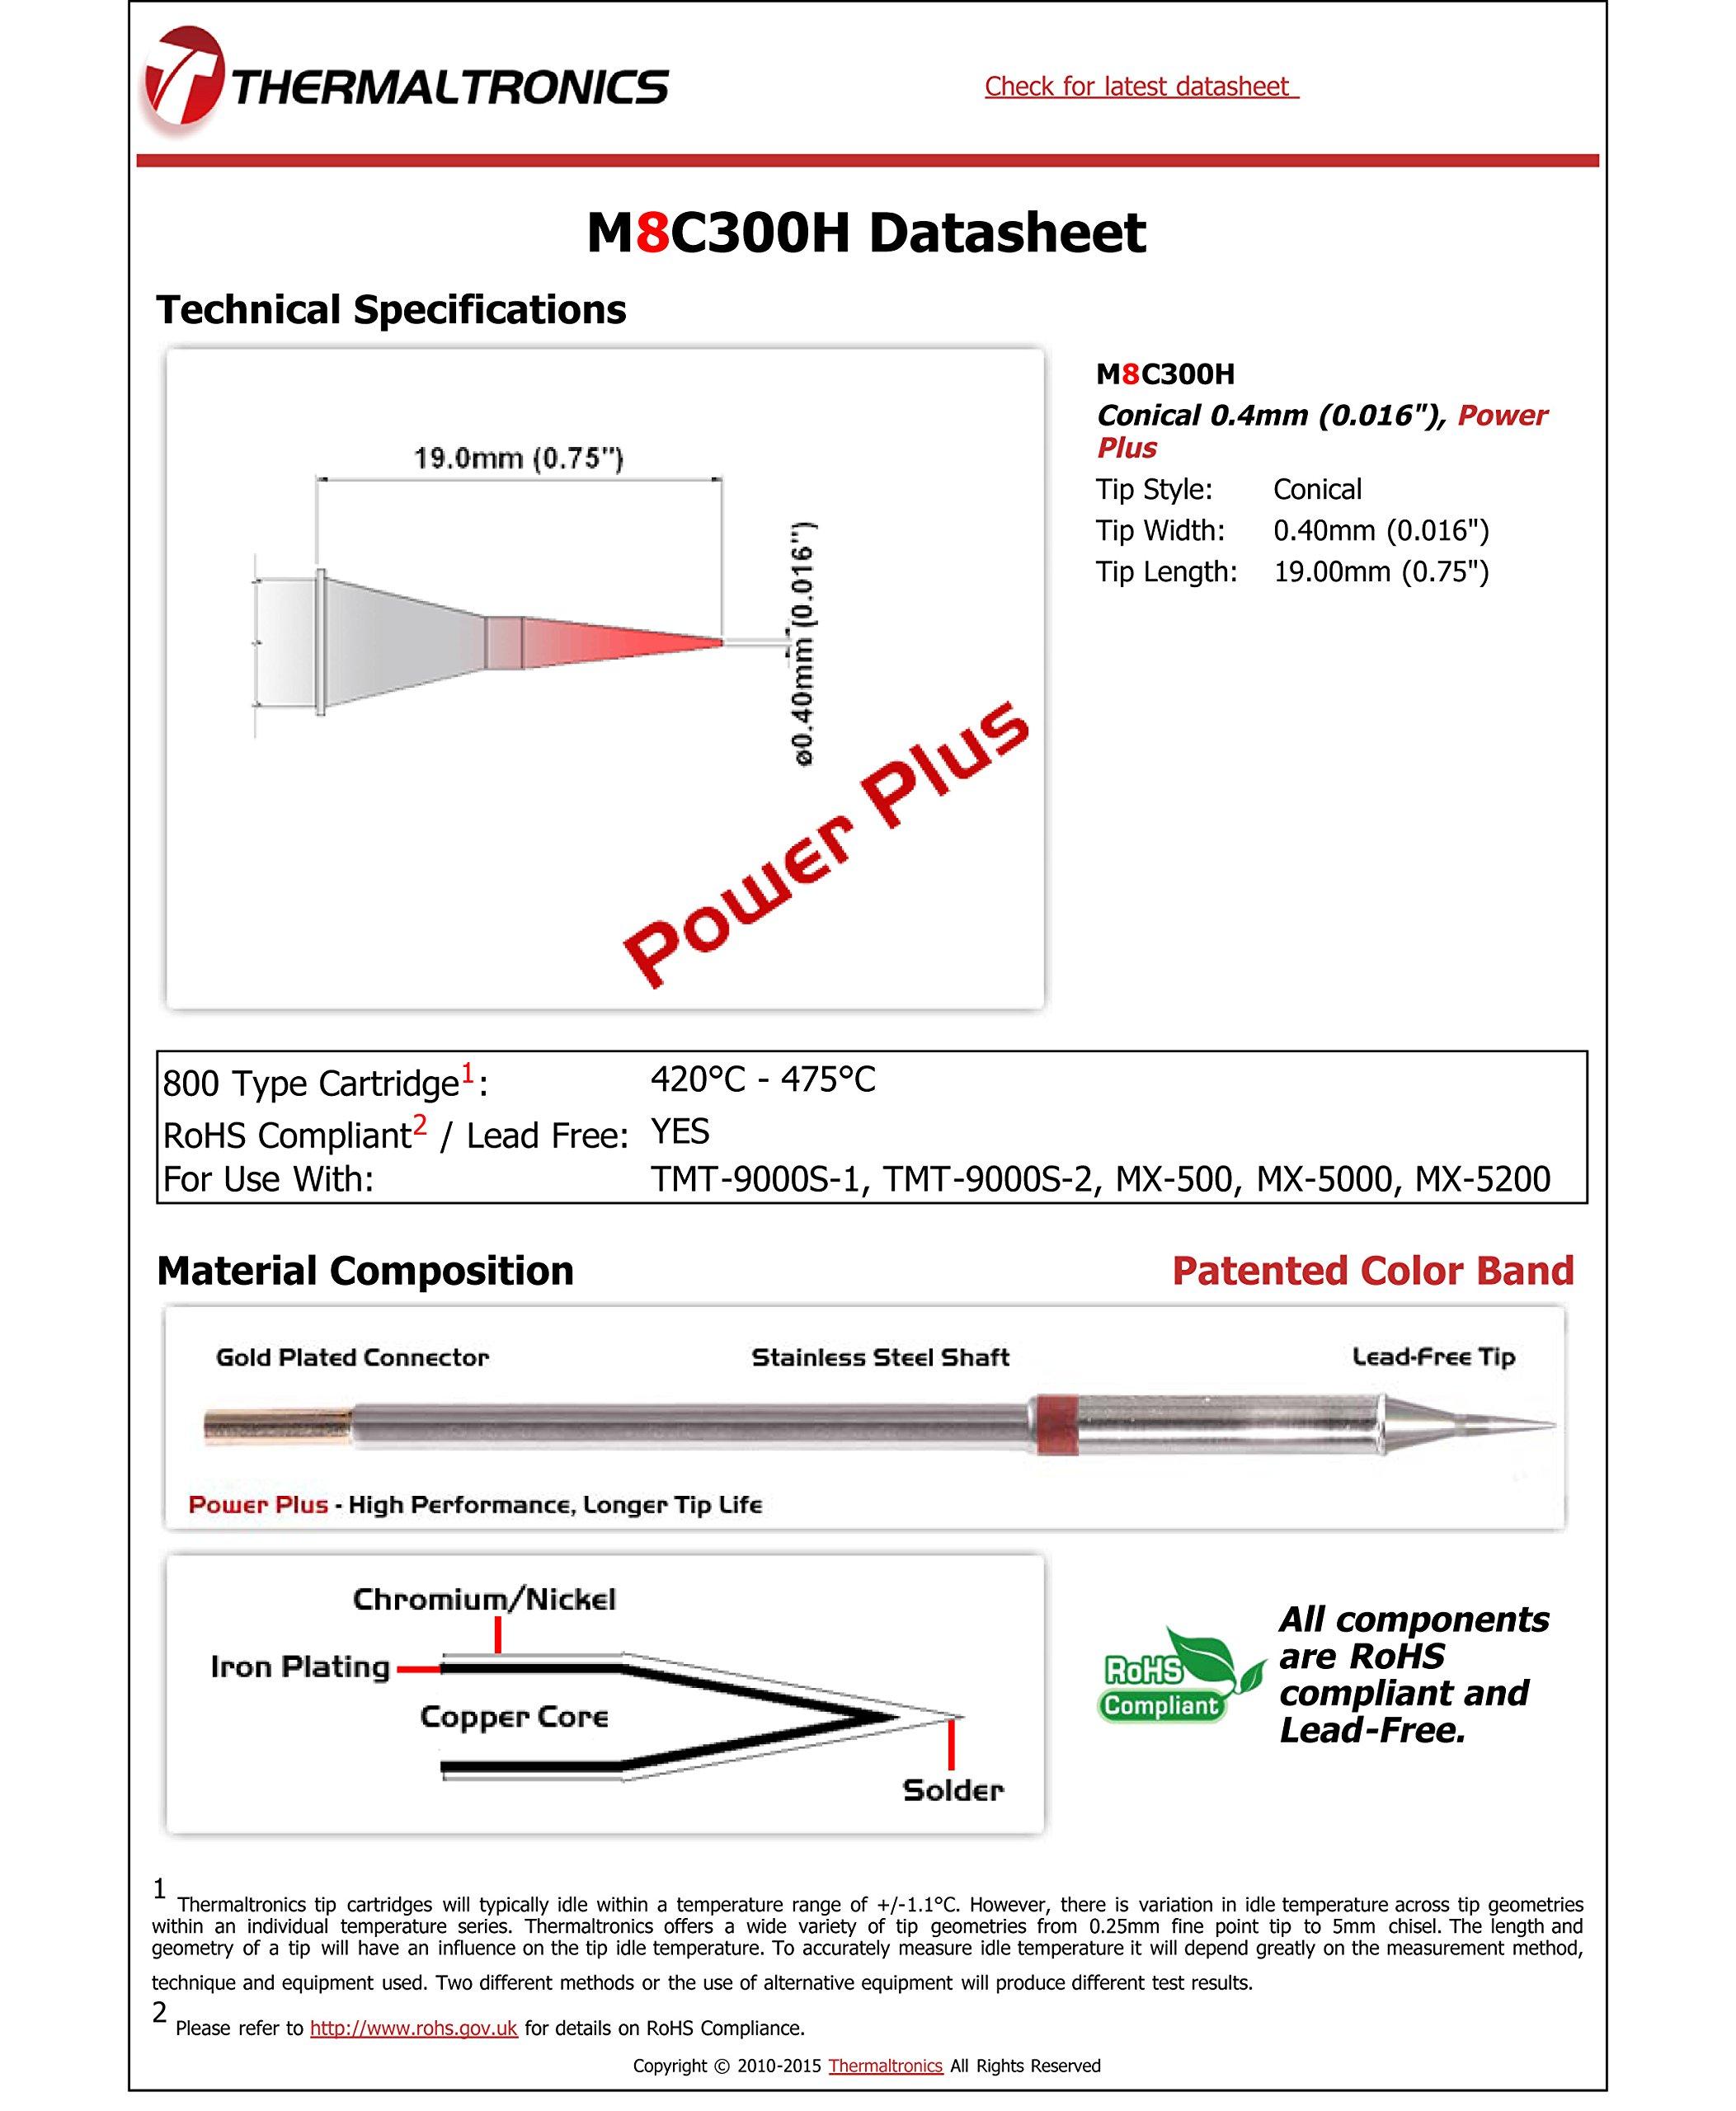 Thermaltronics M8C300H Conical 0.4mm (0.016''), Power Plus